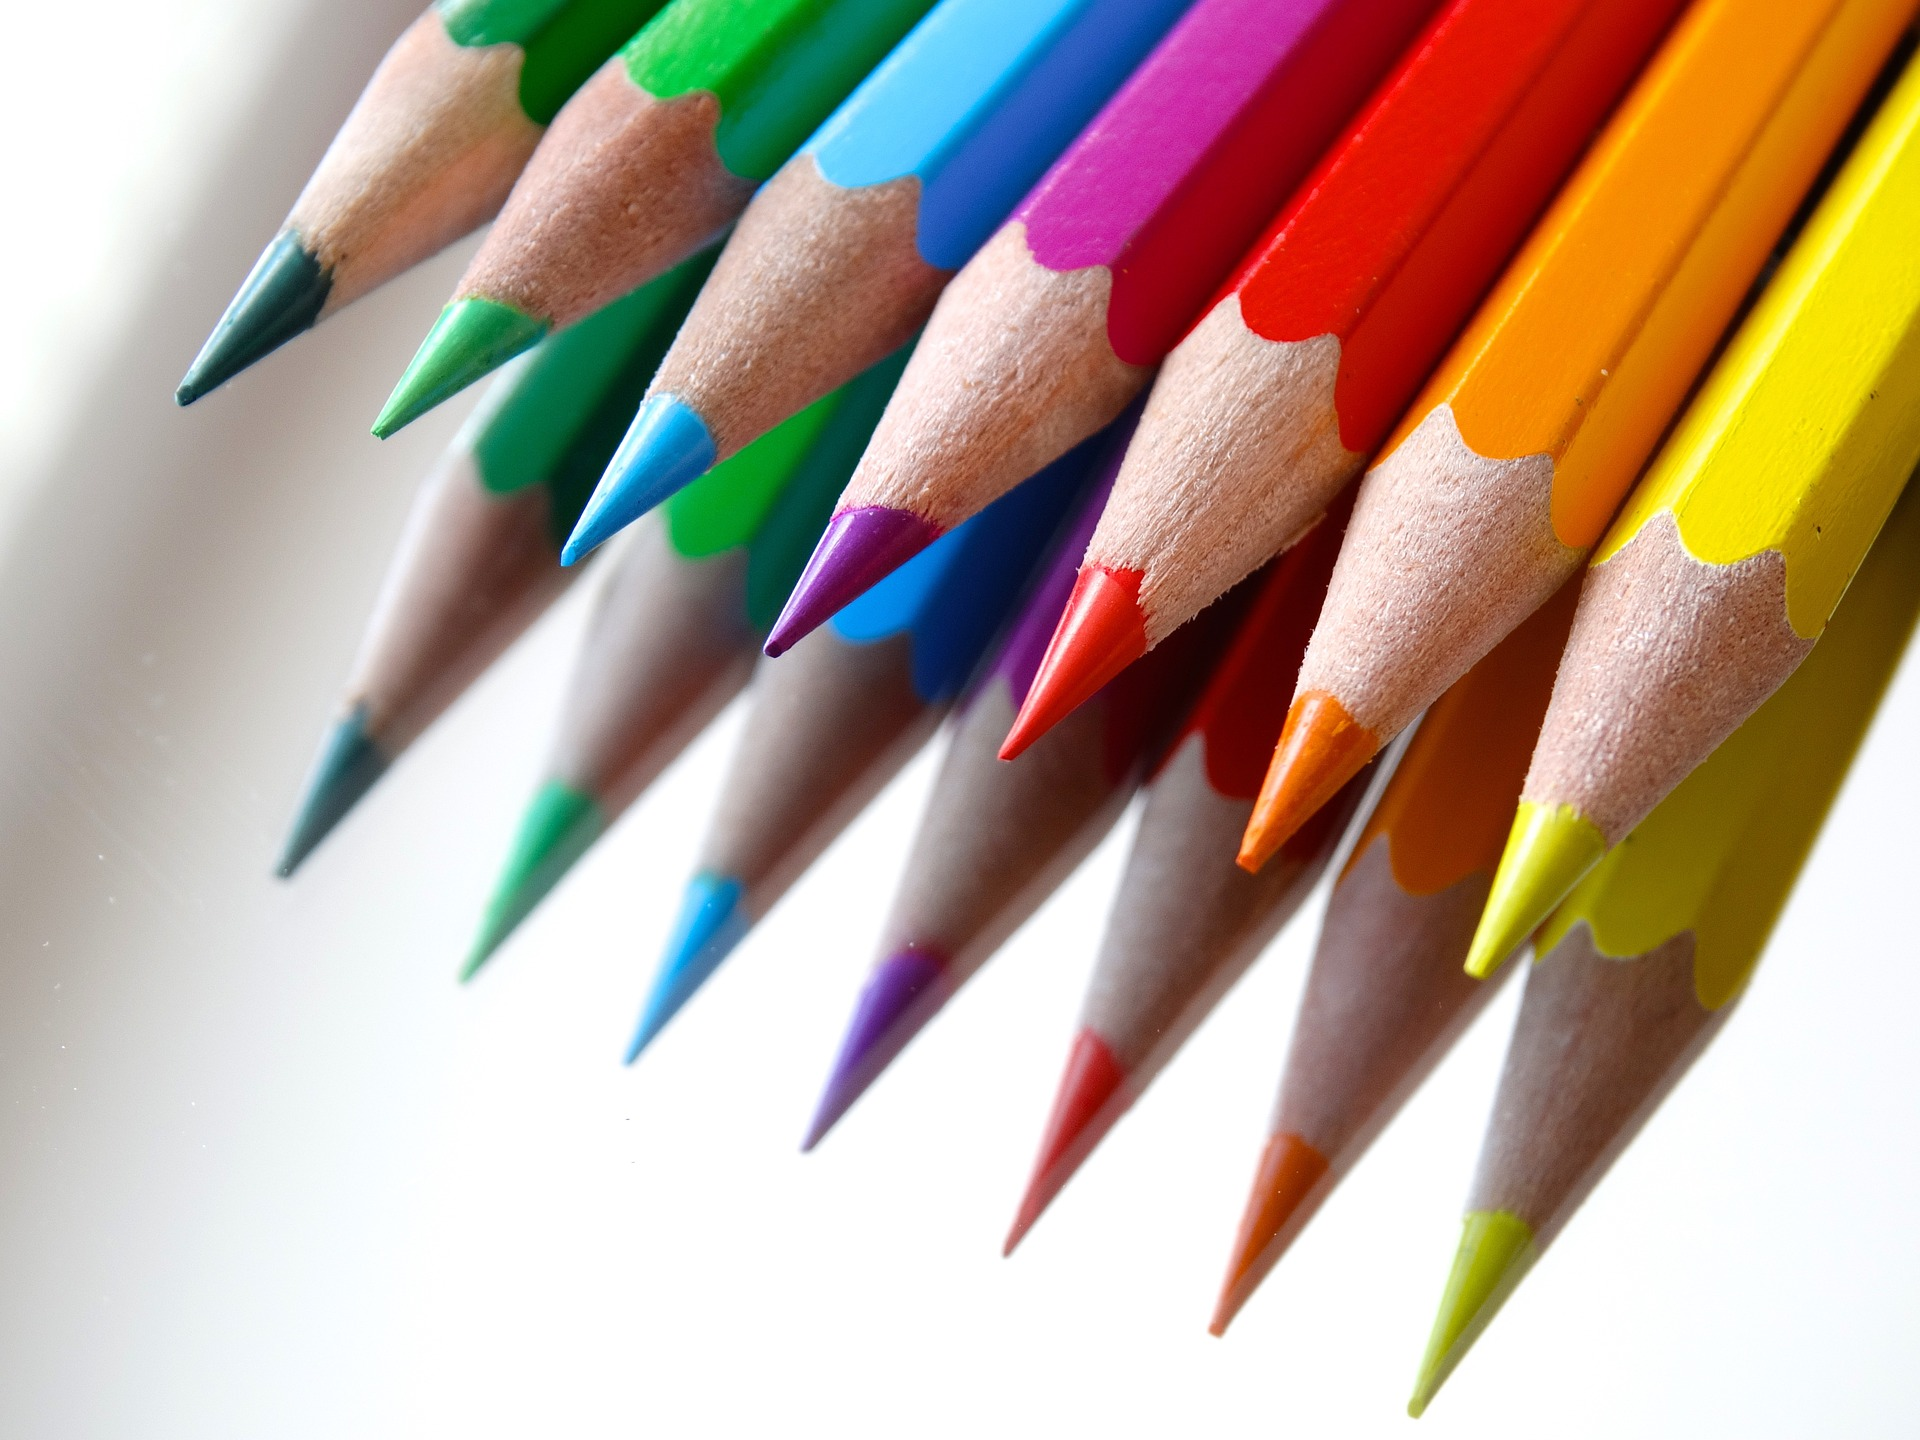 Farver Penne Design Blyanter Skrift Skrive Kreativ